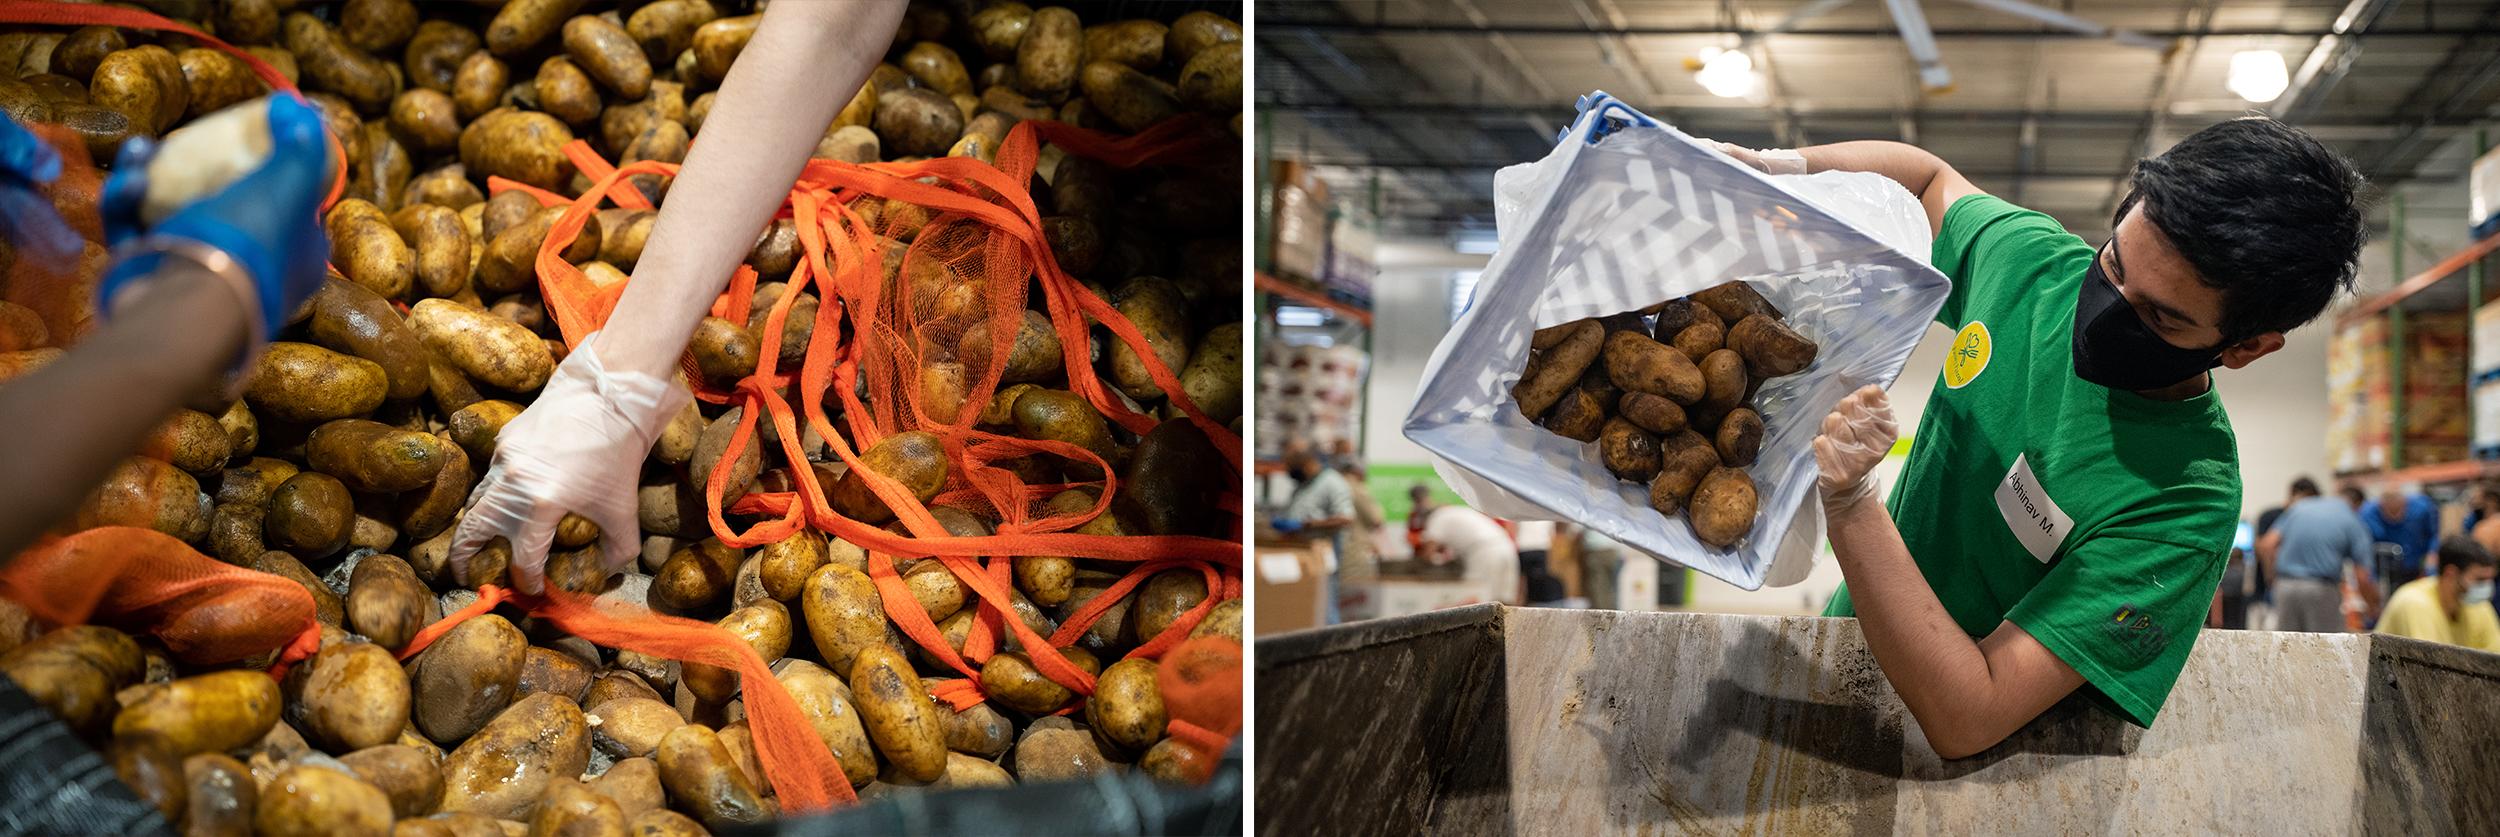 a tight shot of a hand grabbing a potato and Abhinav Meduri sorting potatoes